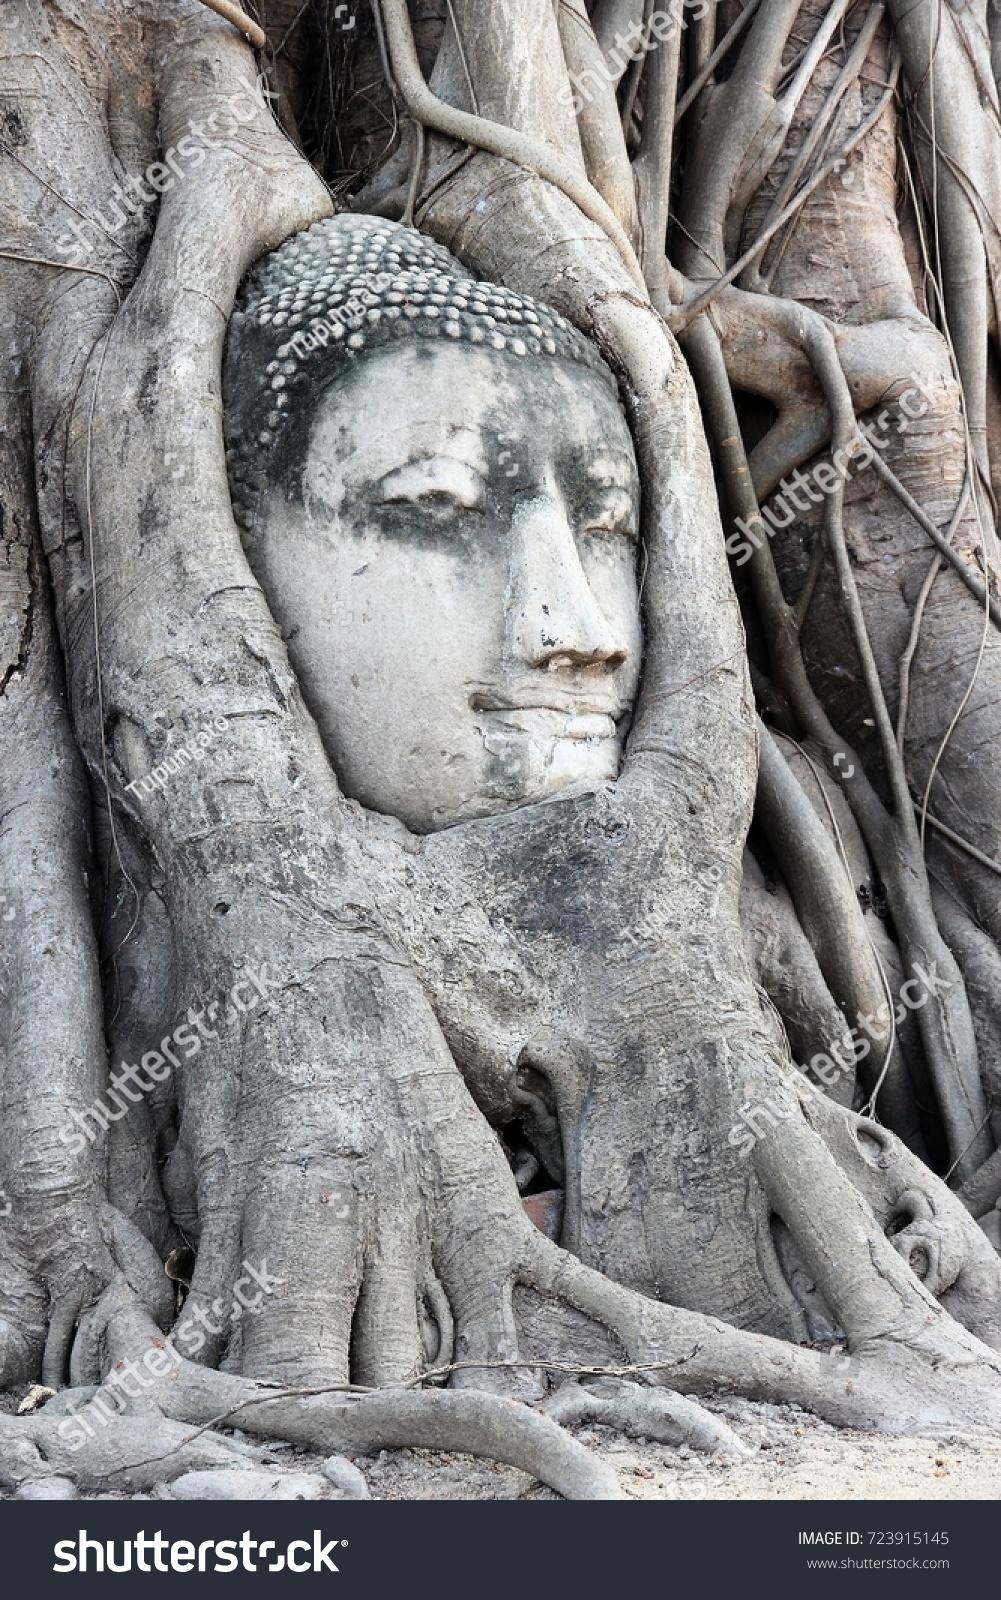 stock-photo-exotic-places-thailand-landm